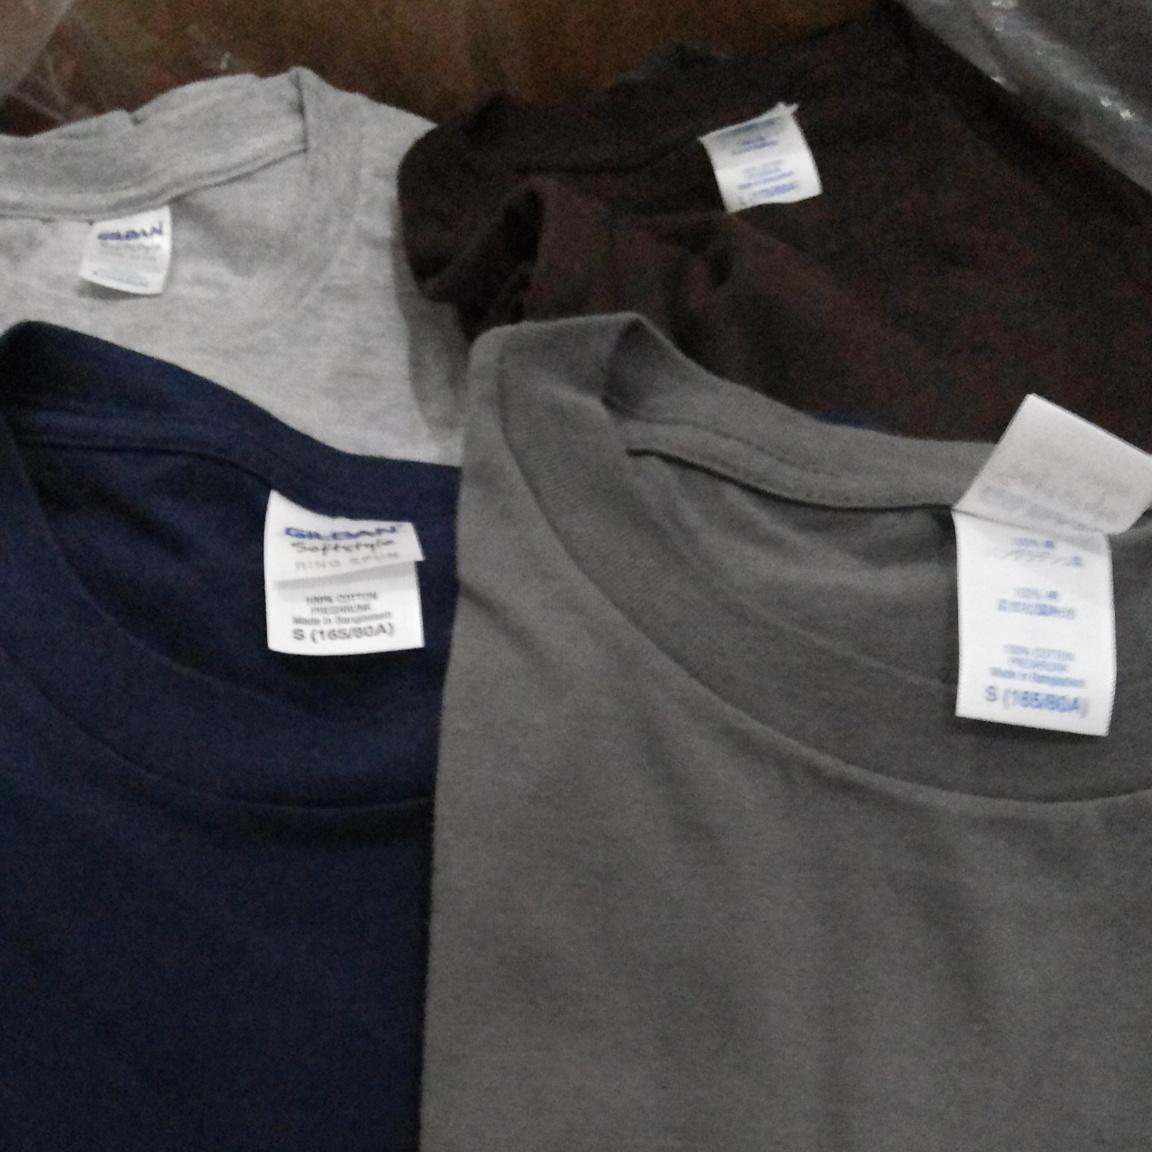 Gildan Softstyle 63000 Kaos Polos Original Sapphire Page 2 Source · Jual kaos polos gildan softstyle